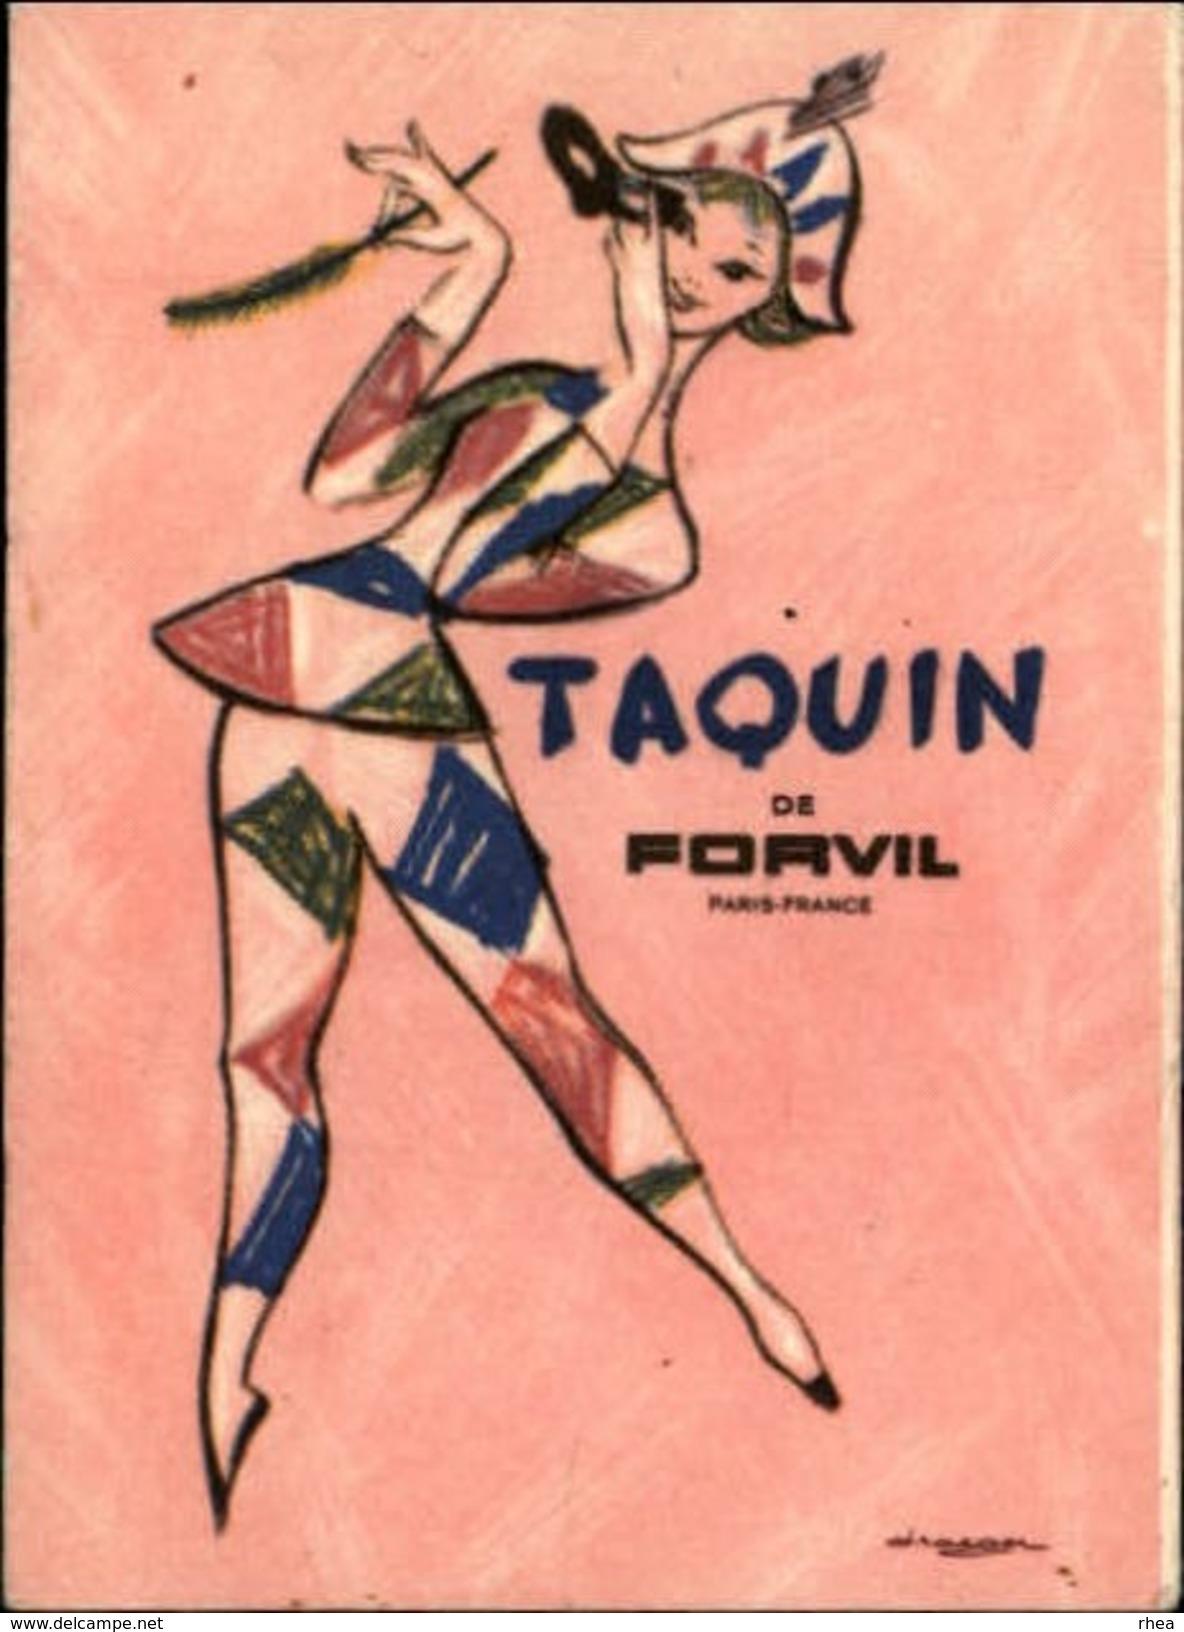 PARFUM - Parfumerie - Taquin De Forvil - Arlequin - Dessin De Draeger - Publicités